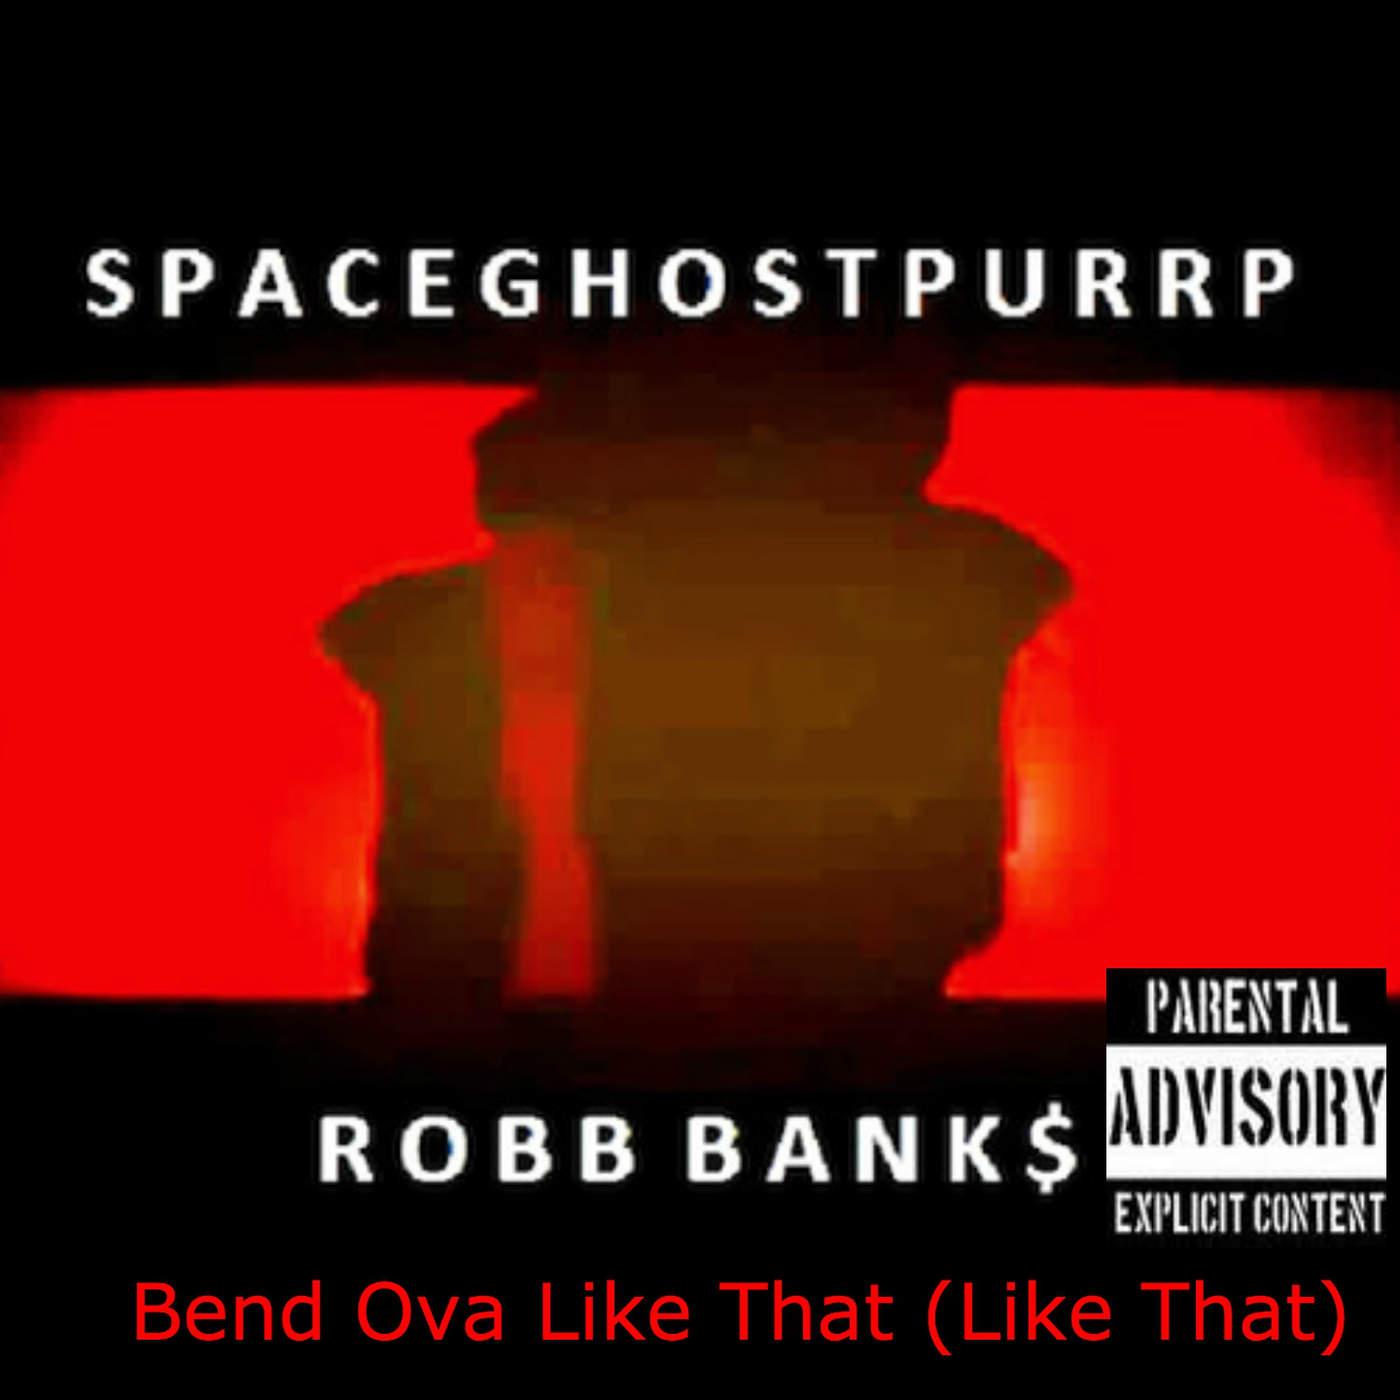 SpaceGhostPurrp - Bend Ova Like That (Like That) [feat. Robb Banks] - Single Cover